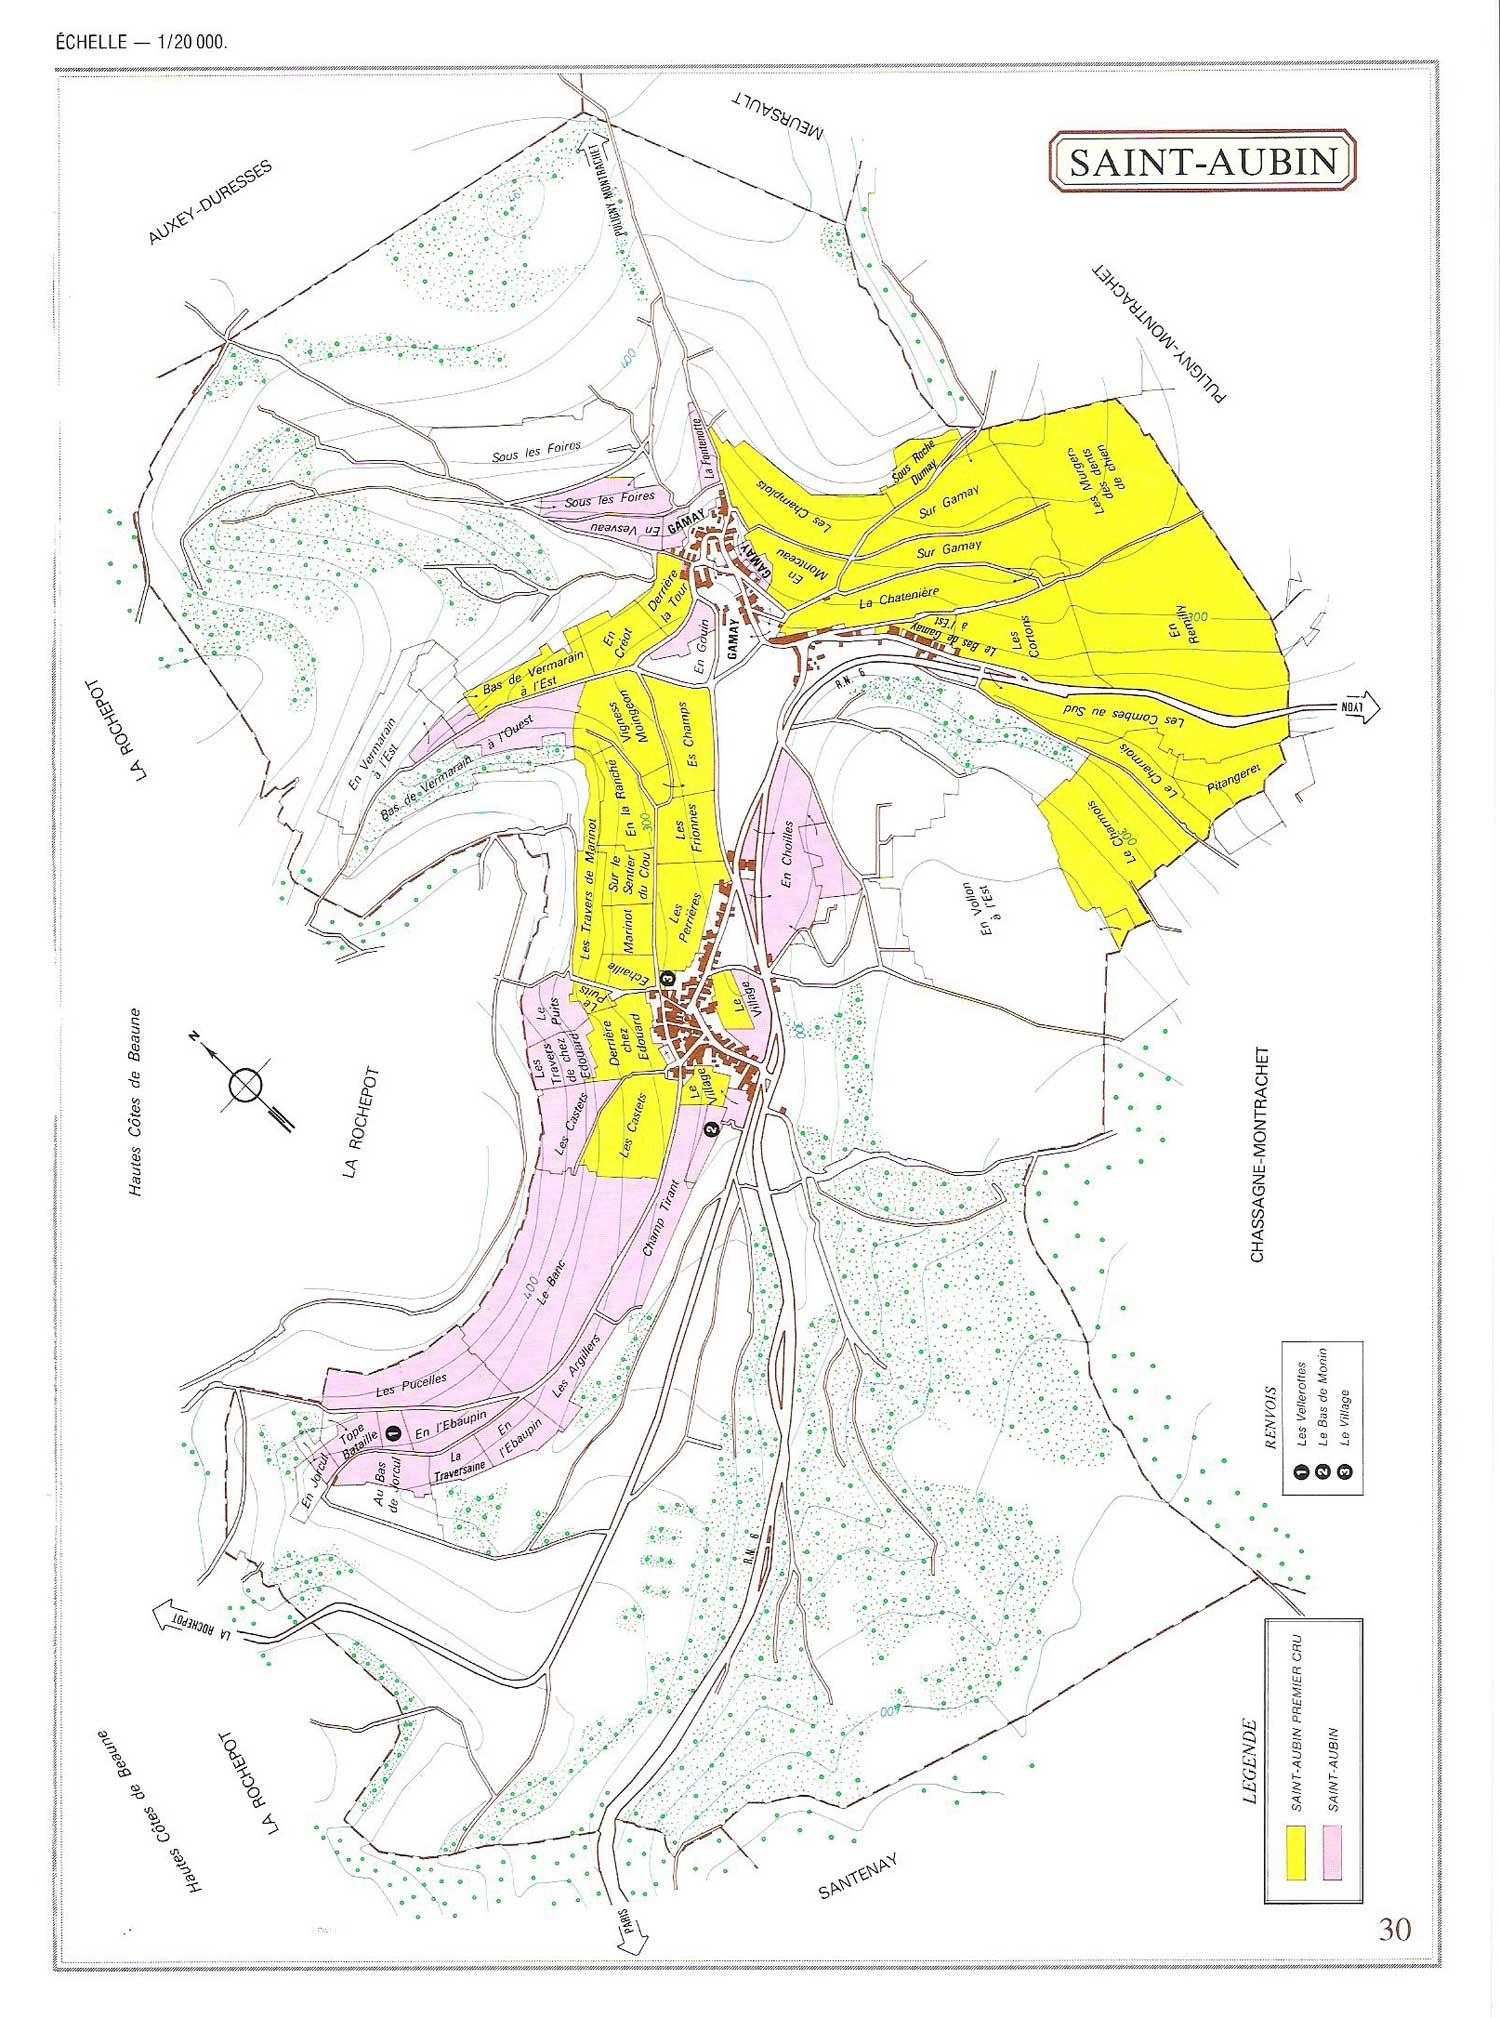 Picture of Saint Aubin Vineyard Map